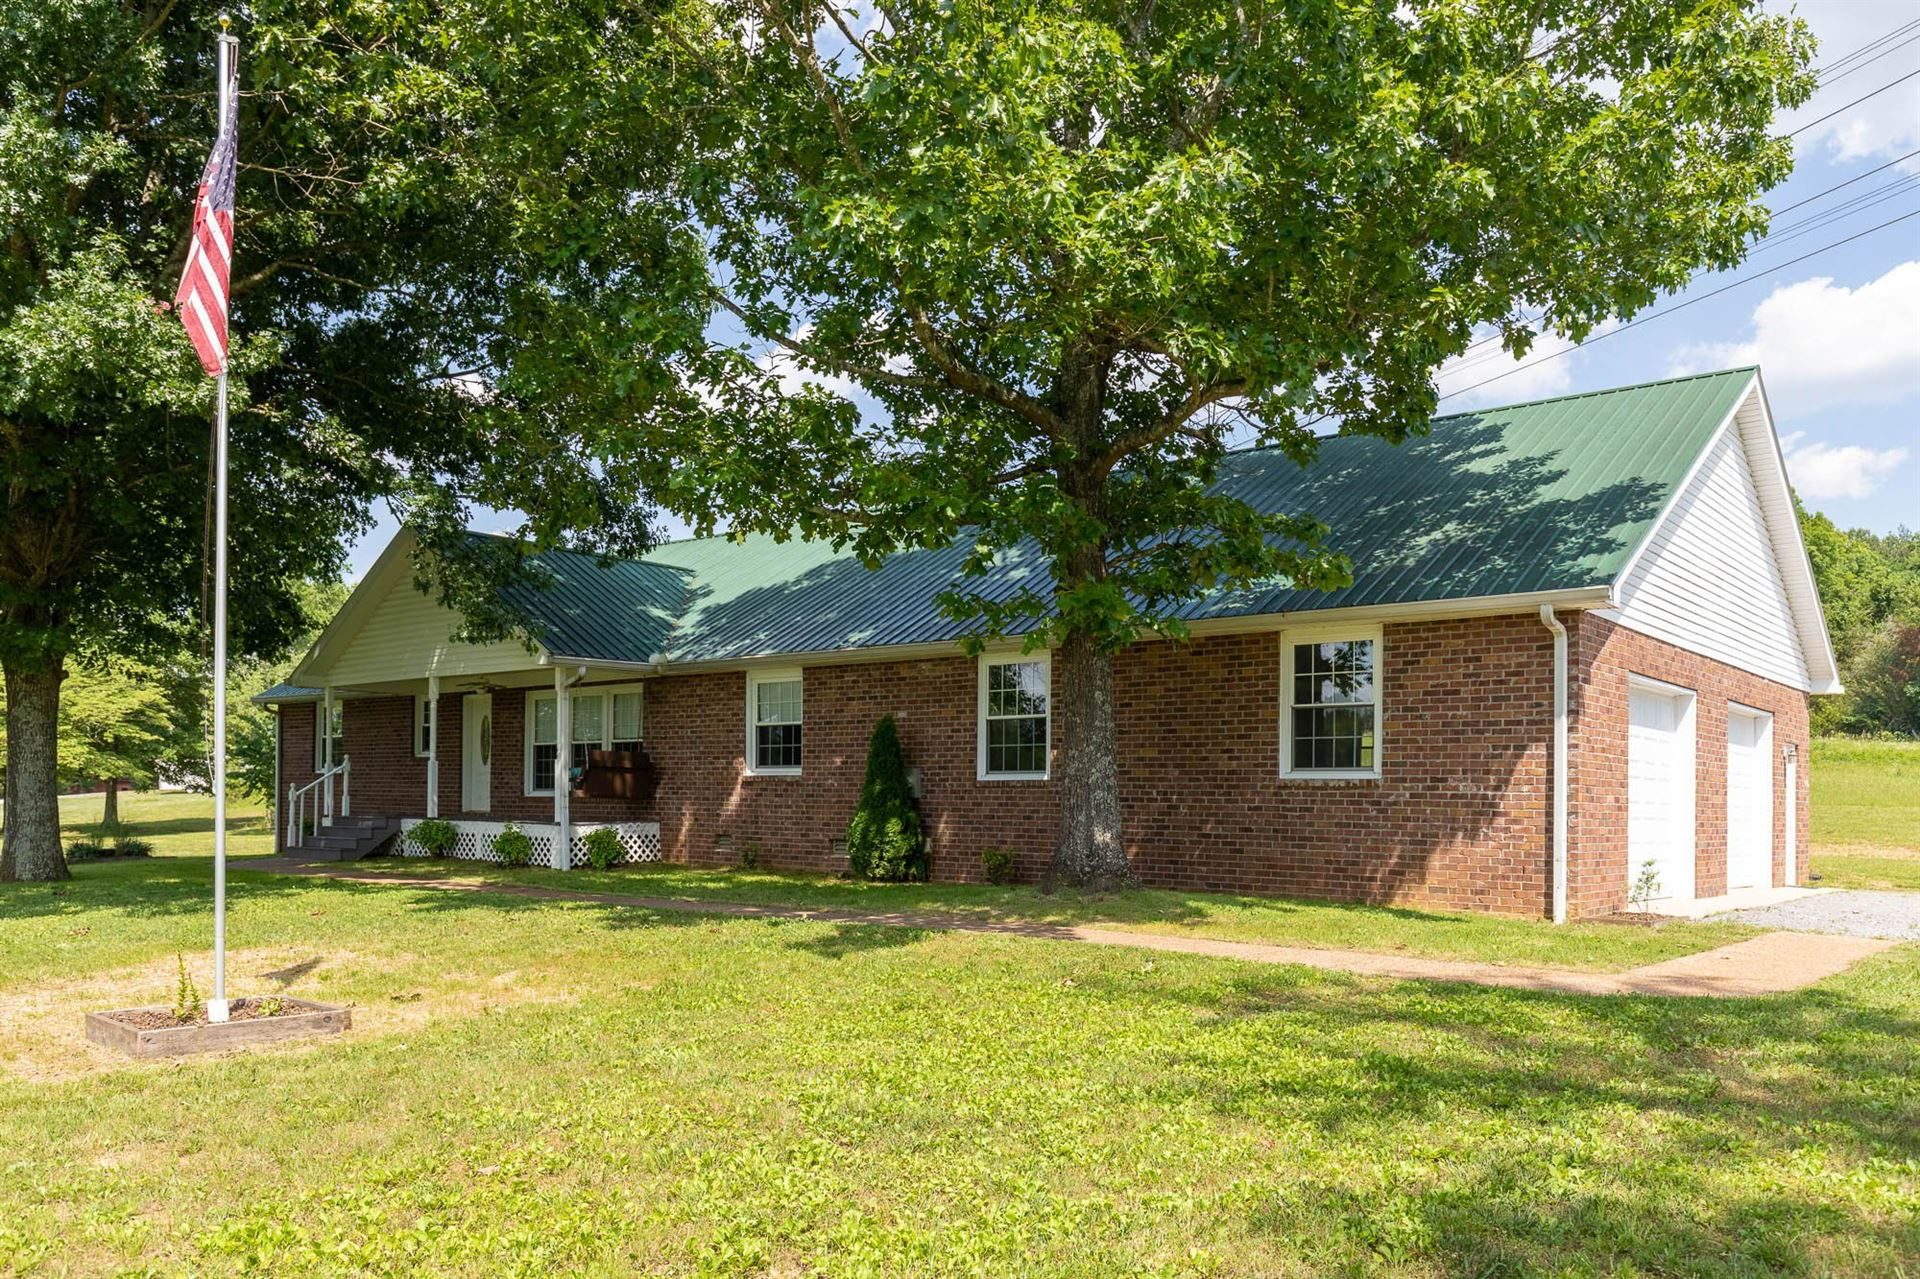 3956 Hill Rd, Rockvale, TN 37153 - MLS#: 2256879